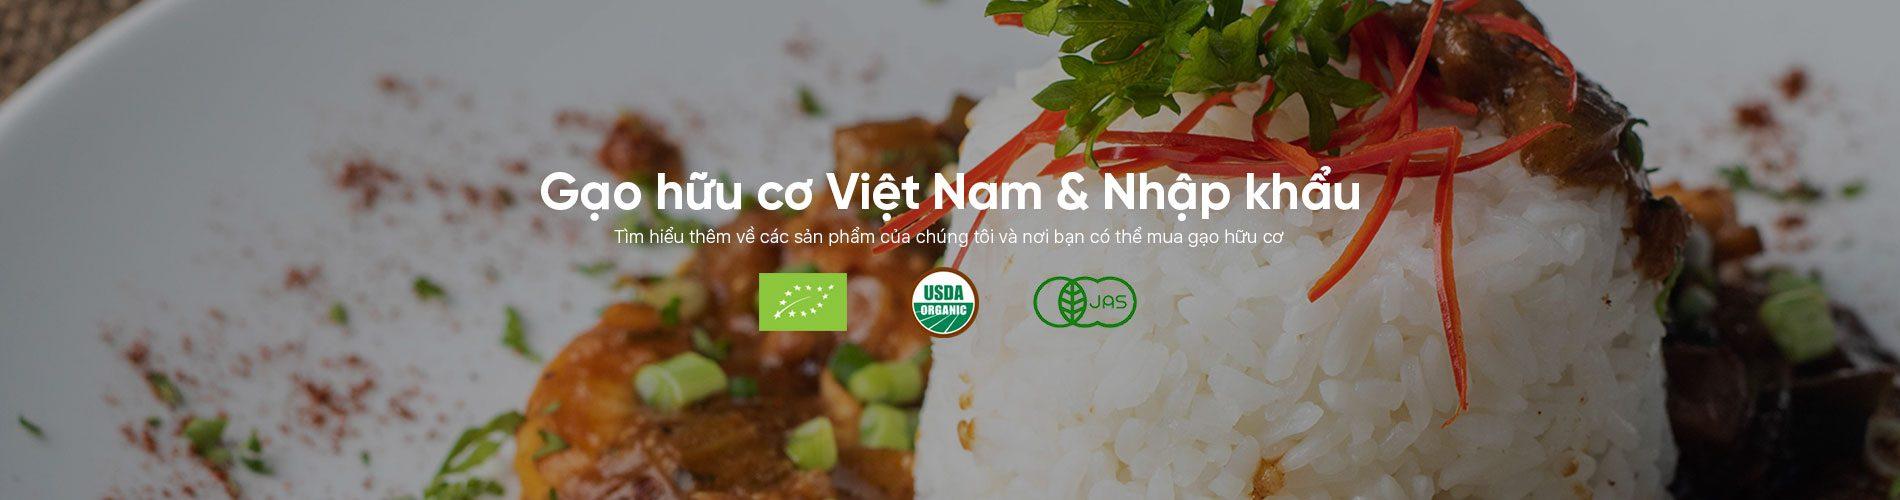 Gạo hữu cơ Việt Nam & Gạo hữu cơ nhập khẩu